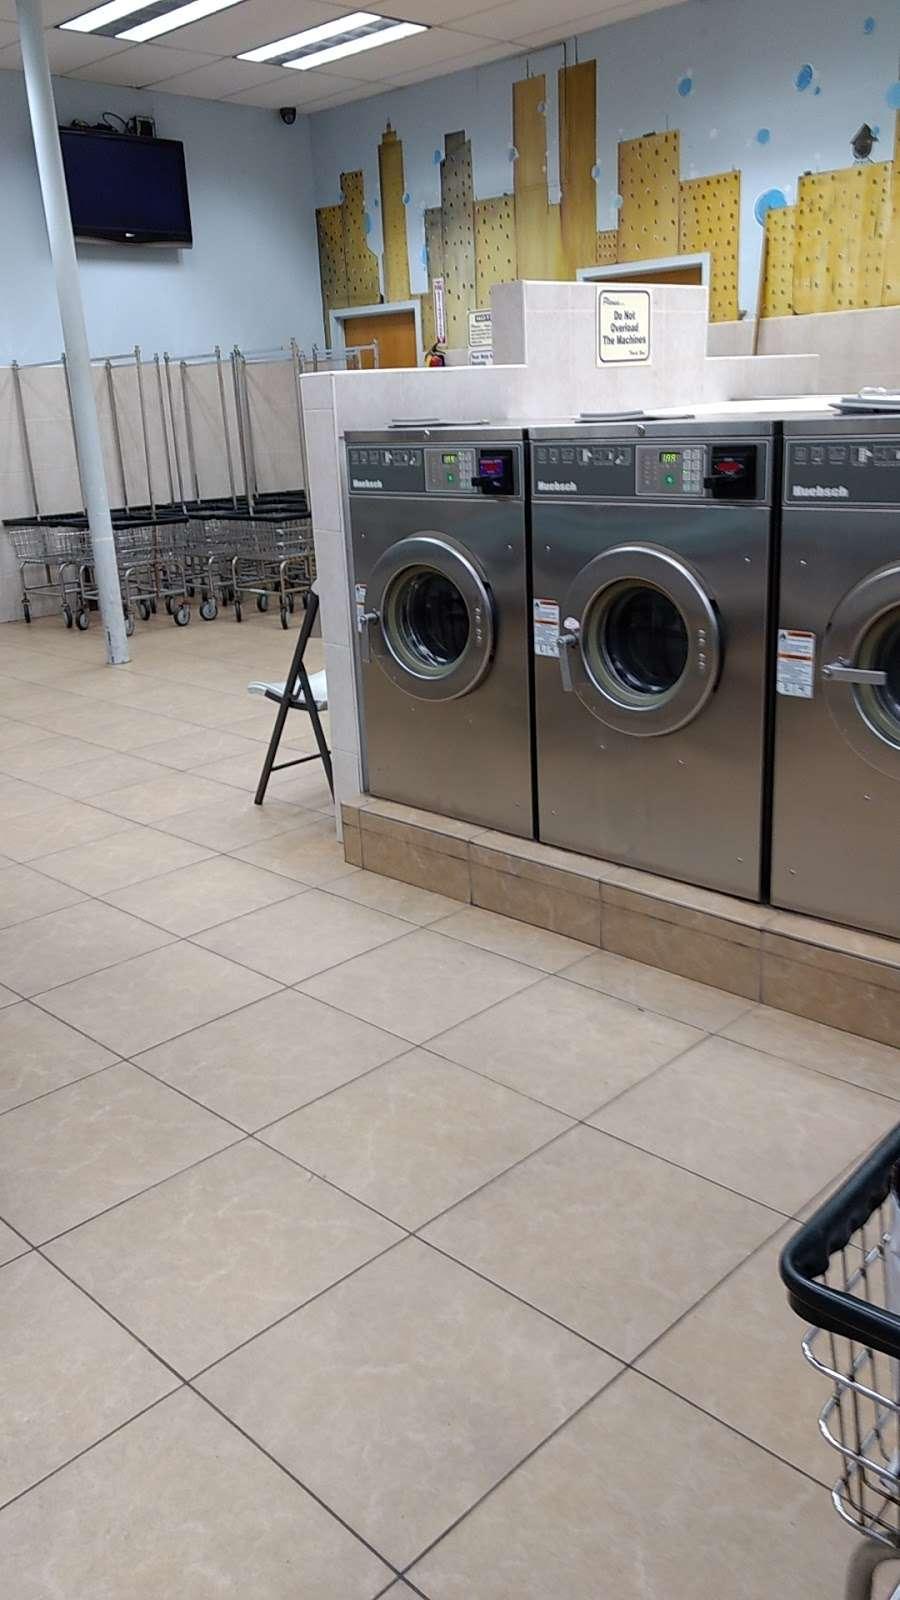 Arlington Laundromat - laundry  | Photo 3 of 5 | Address: 493 Ridge Rd, North Arlington, NJ 07031, USA | Phone: (201) 997-5757